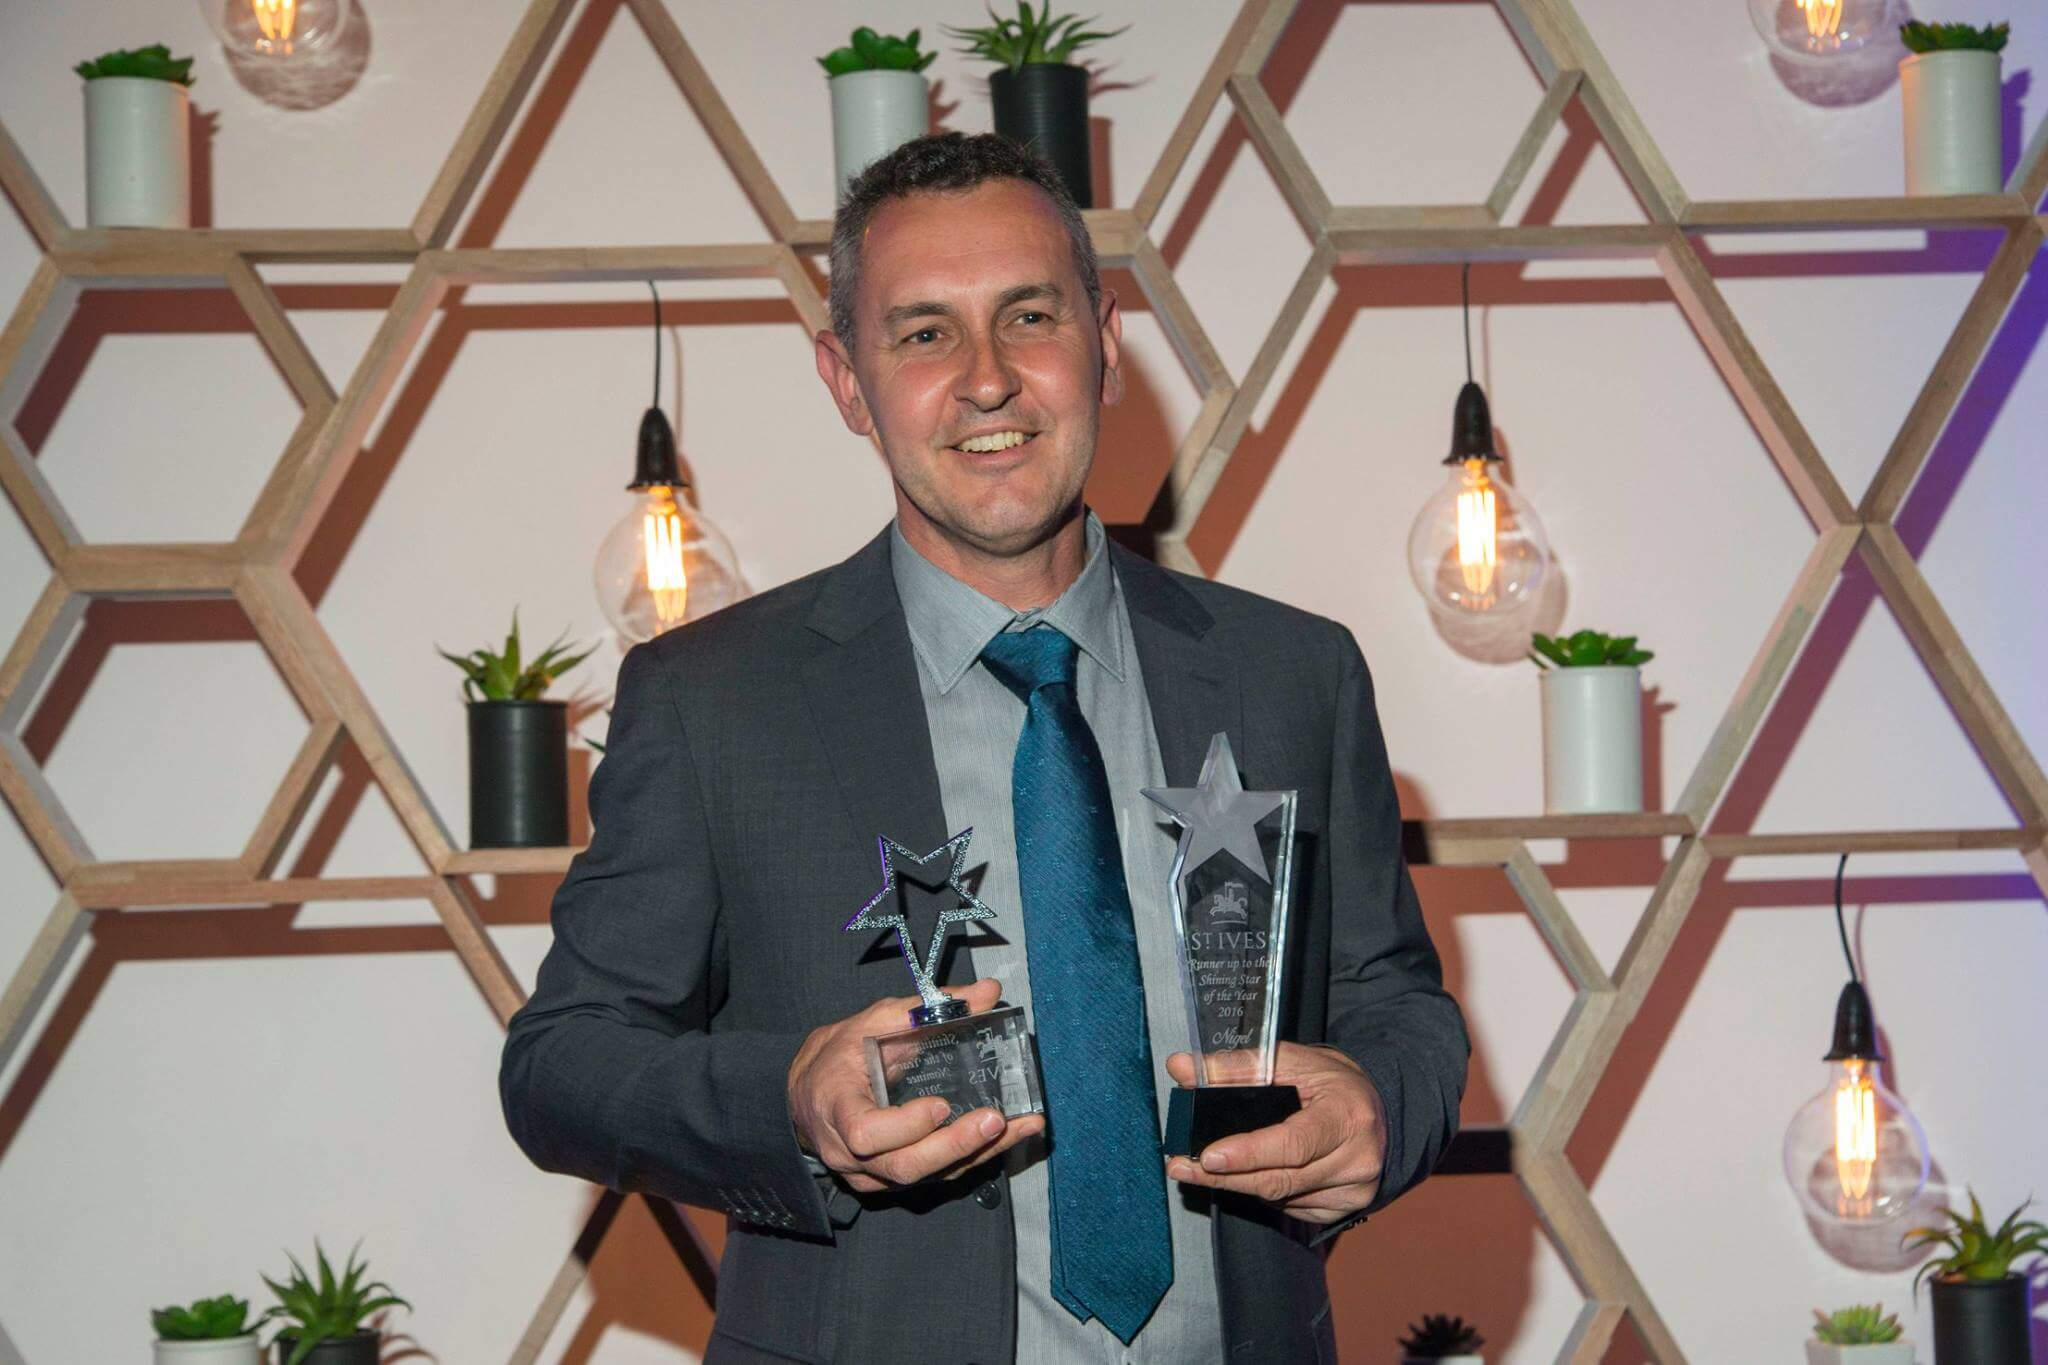 St Ives Murdoch Village Services Officer, Nigel Timms